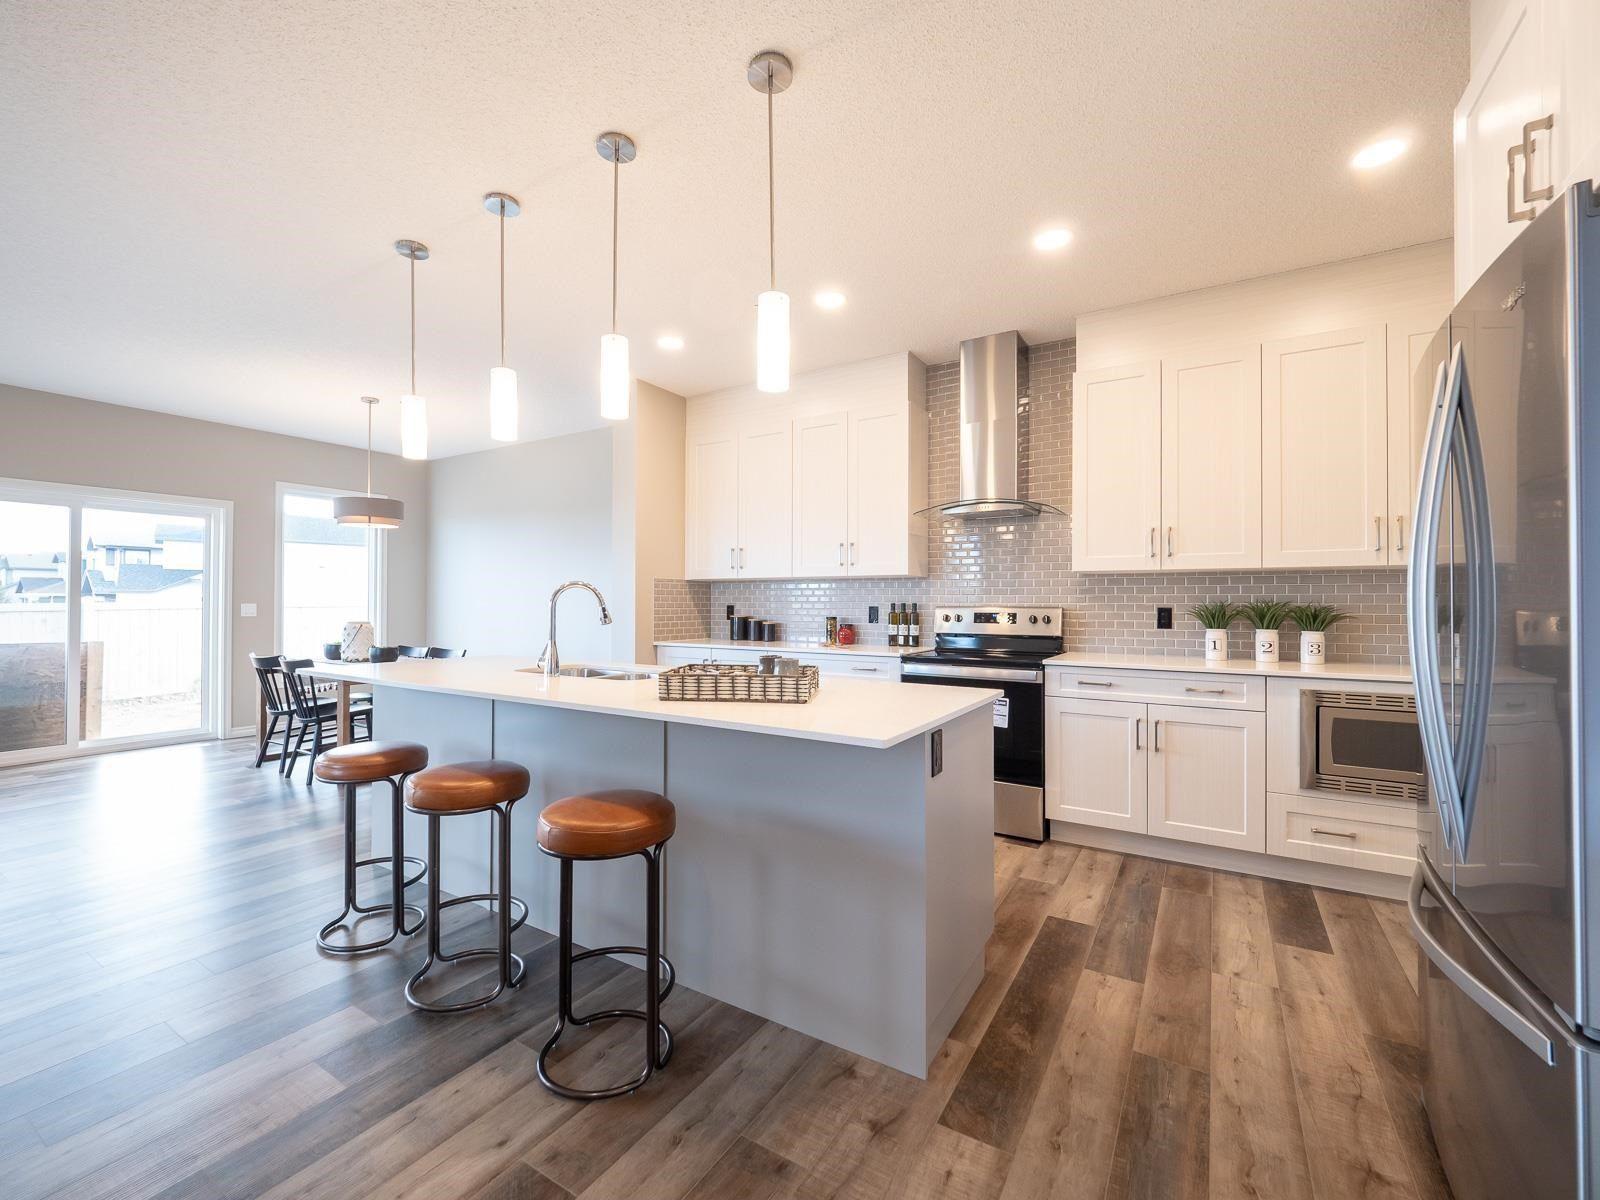 Main Photo: 15824 30 Avenue SW in Edmonton: Zone 56 House for sale : MLS®# E4257189